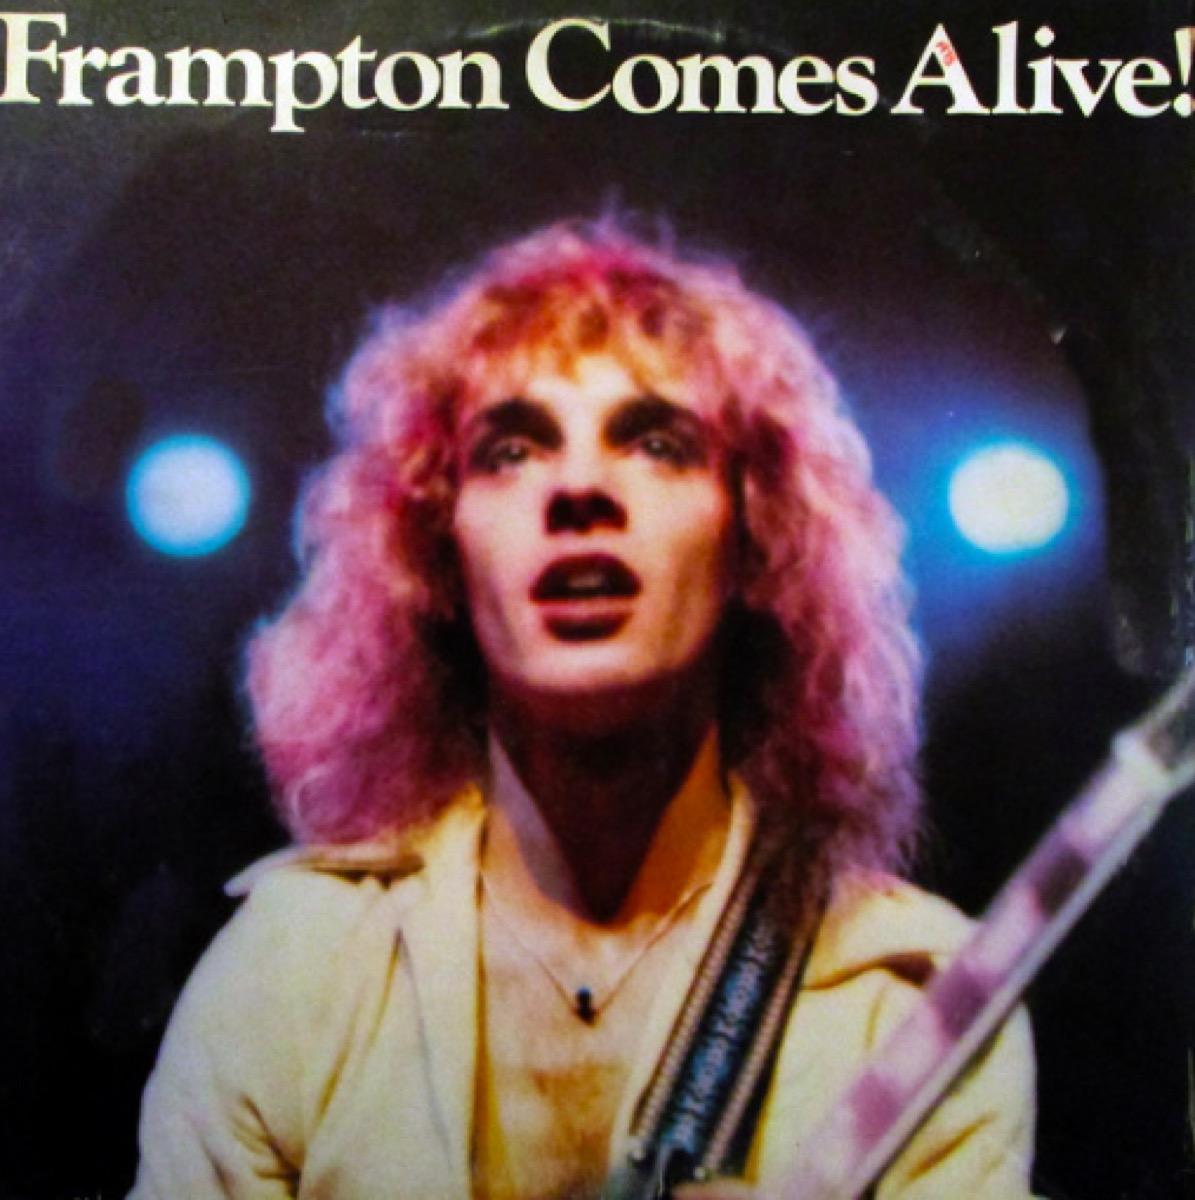 Frampton Comes Alive album